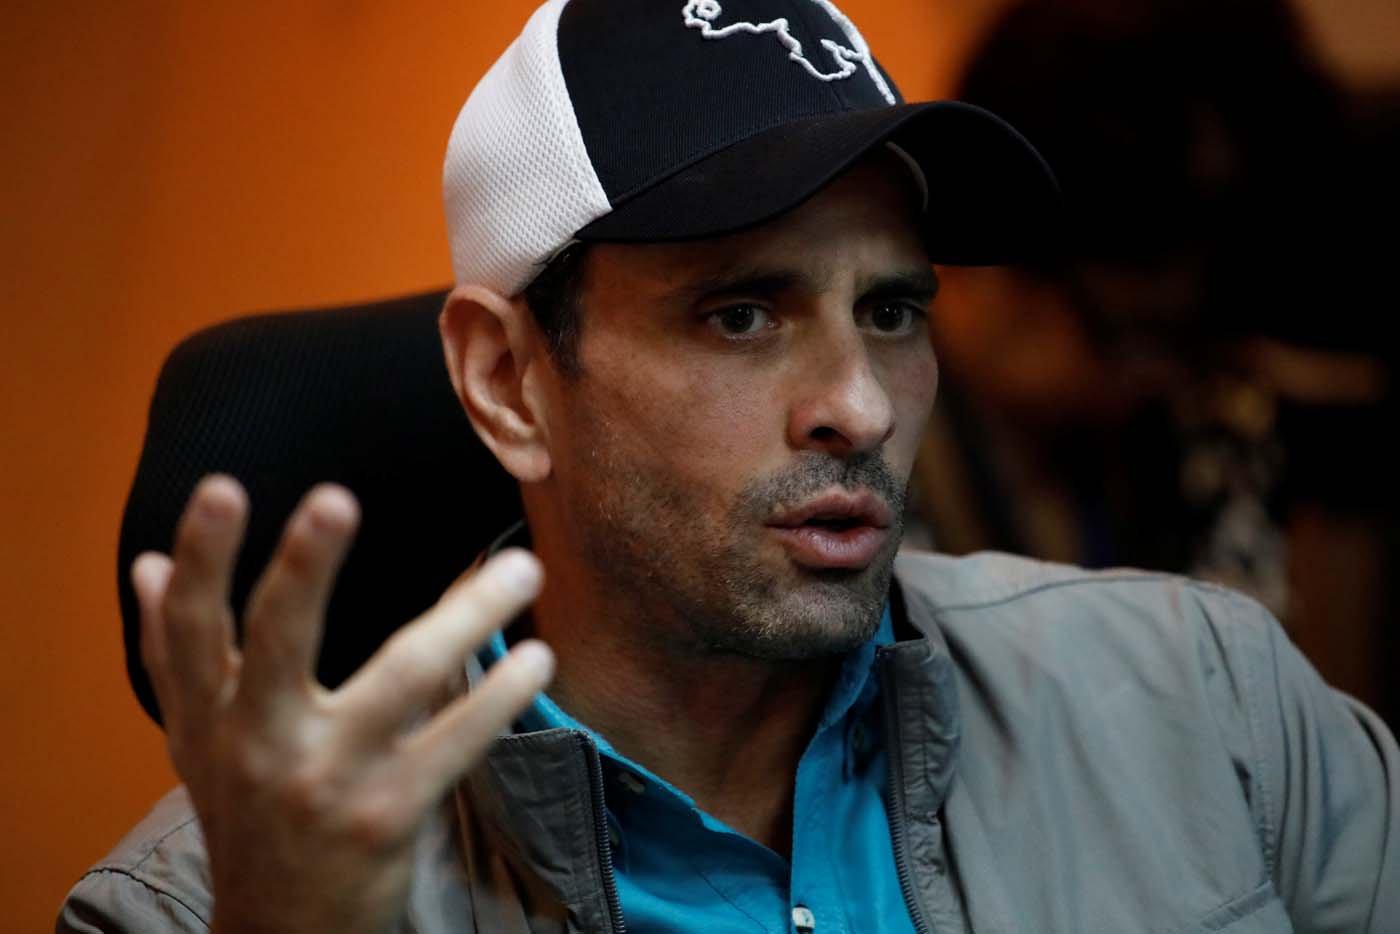 Andres Martinez Casares